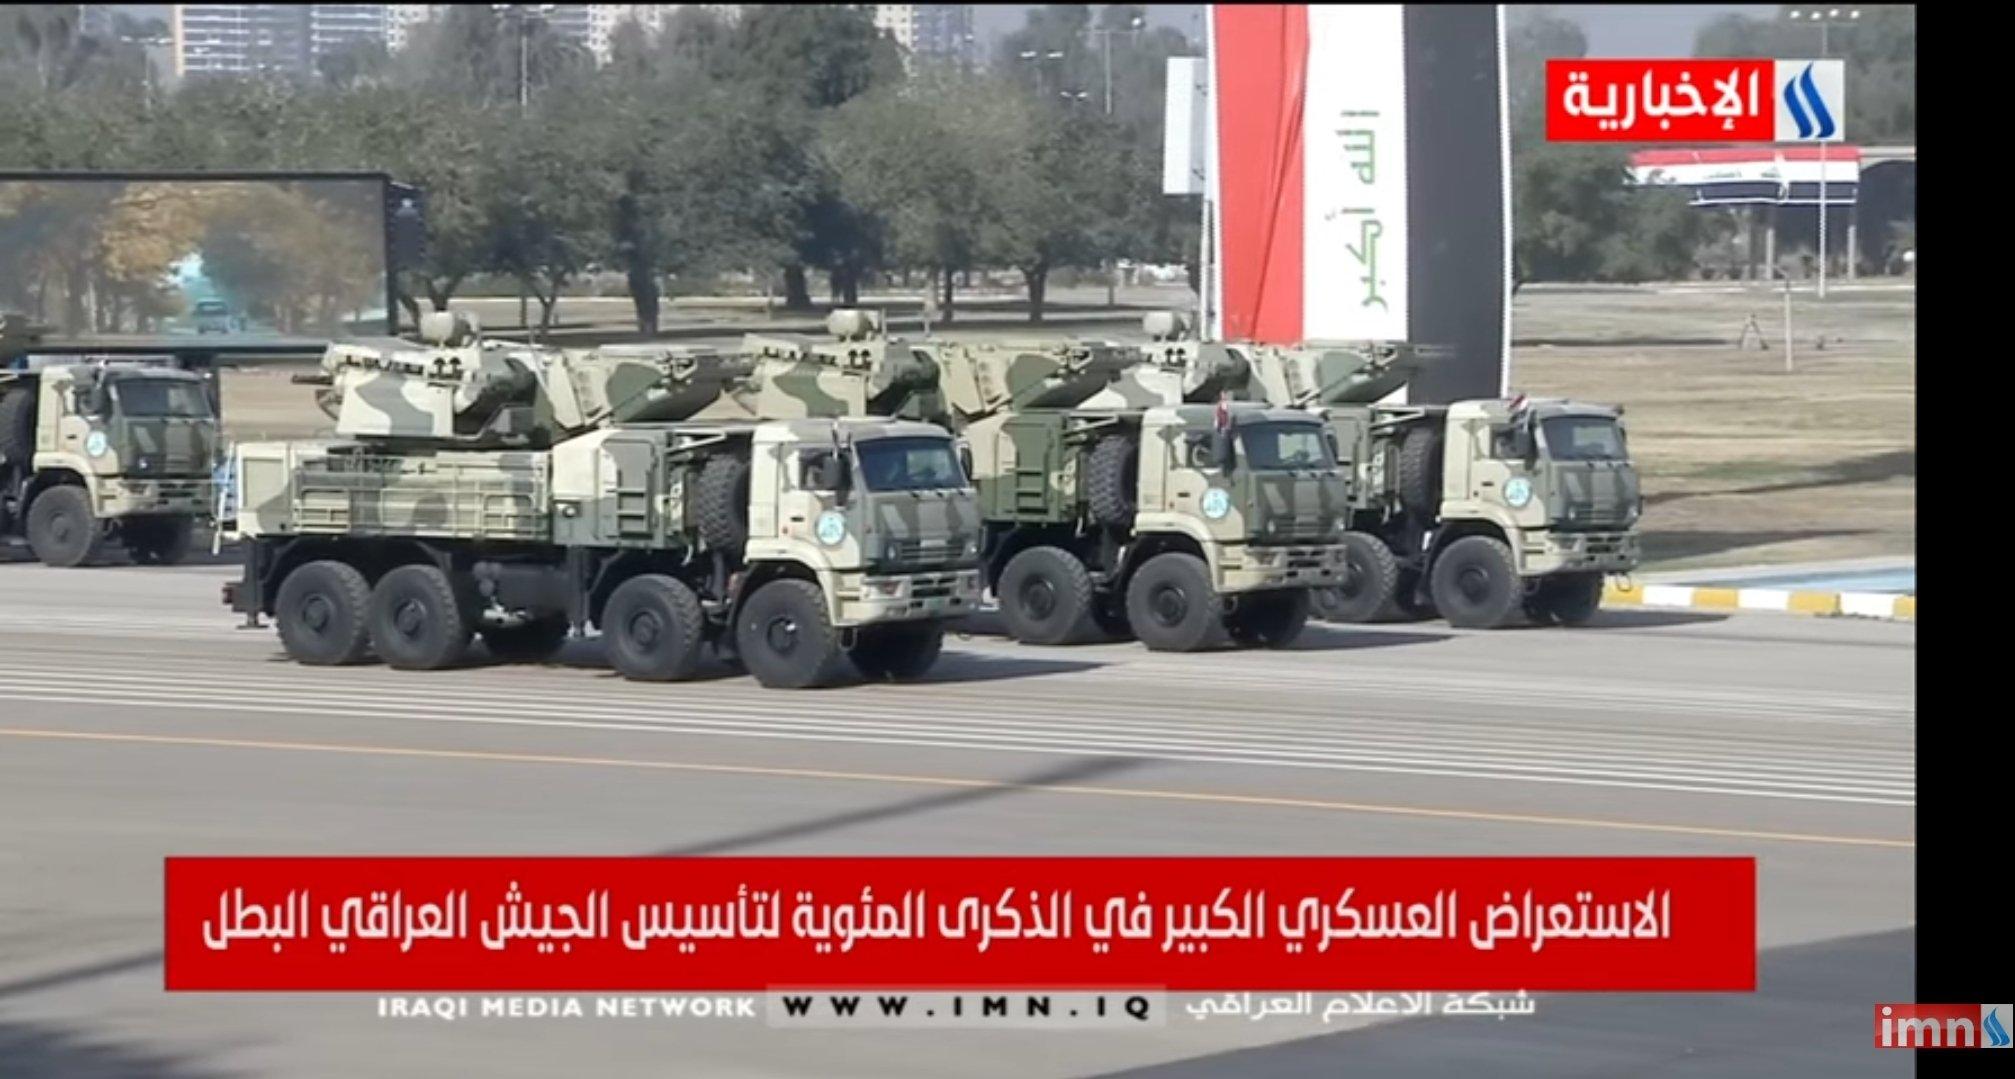 Armée Irakienne / Iraqi Armed Forces - Page 38 ErHxz-NXcAAEBpl?format=jpg&name=large